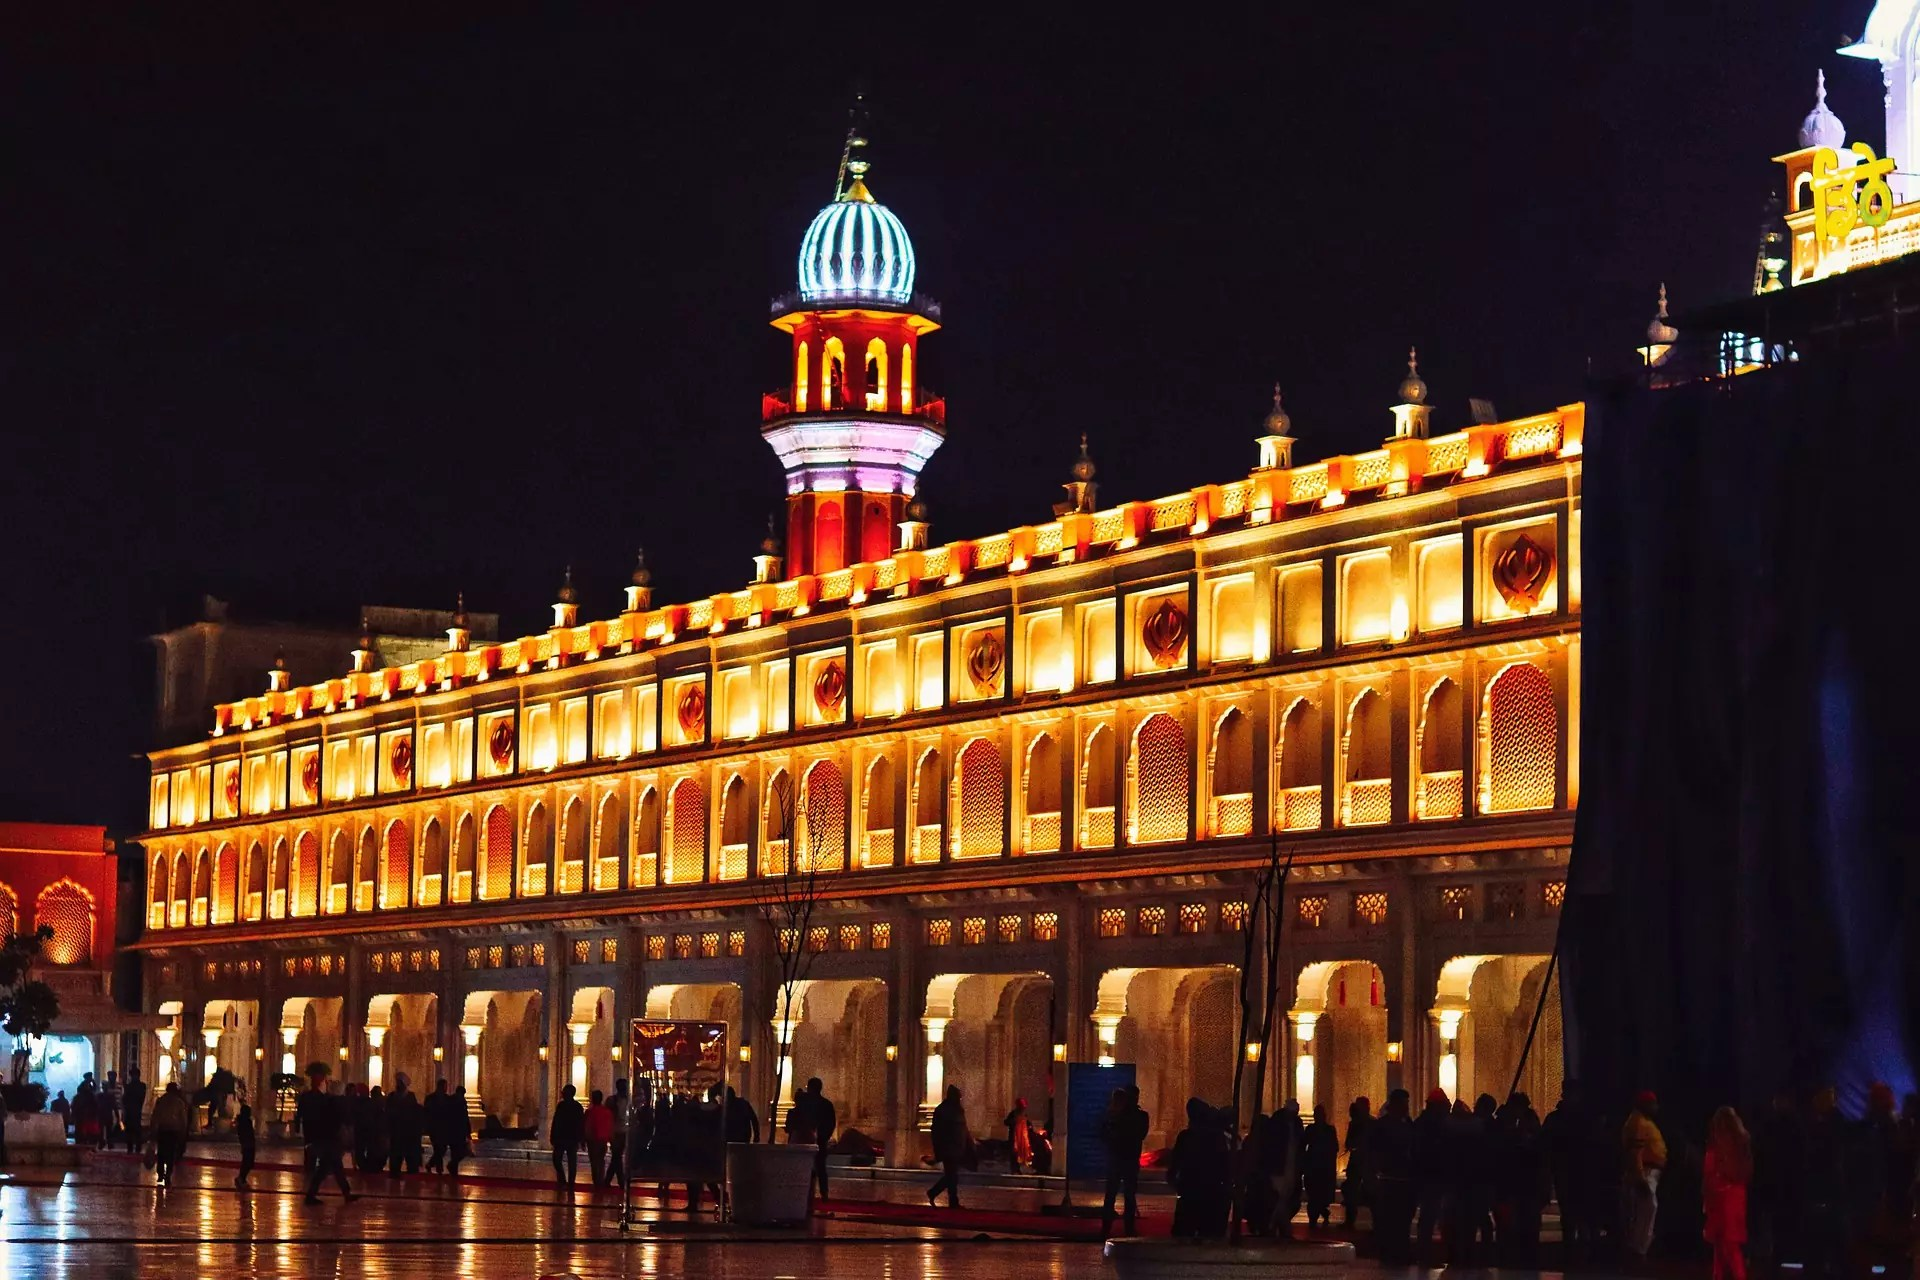 Anthony Bourdain Punjab - Sikh temple in Amritsar, Punjab, India - photo by D George under Pixabay License